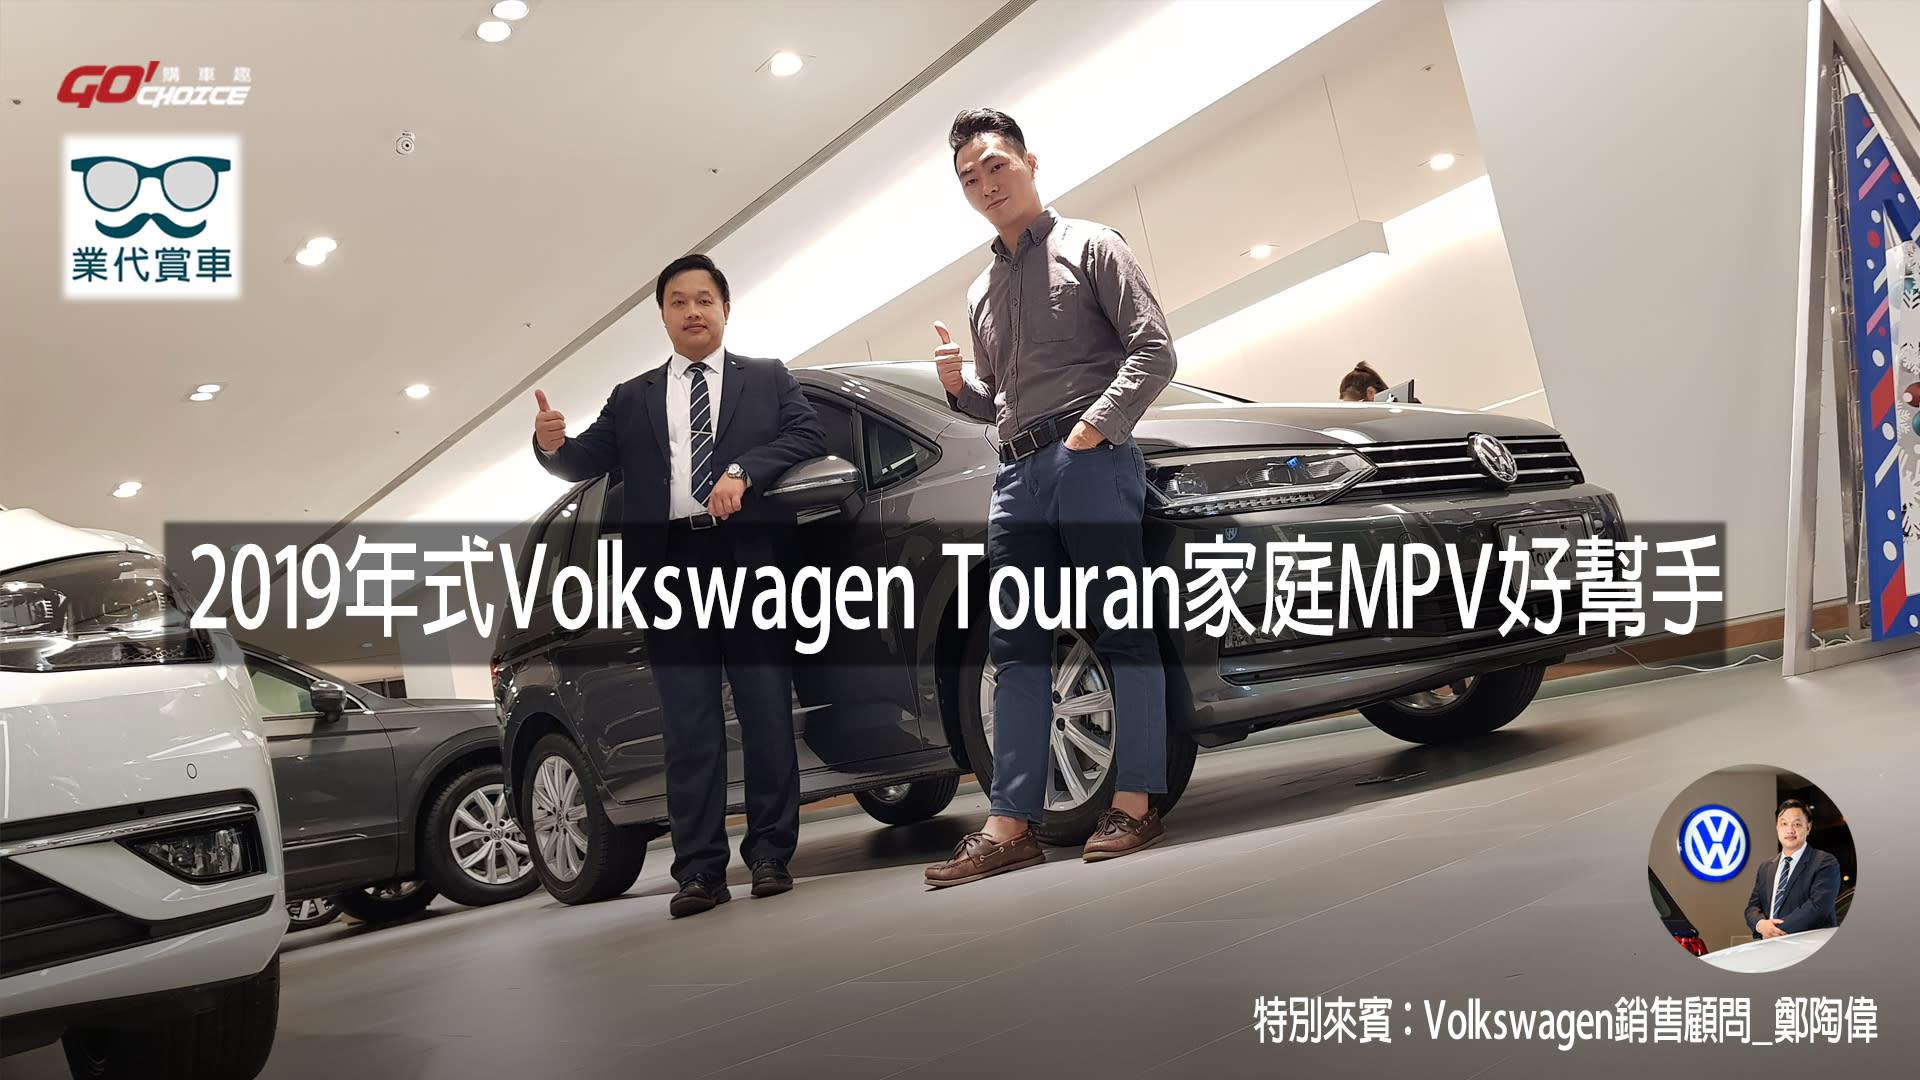 [業代賞車]2019年式Volkswagen Touran家庭MPV好幫手-Volkswagen敦南 銷售顧問_鄭陶偉